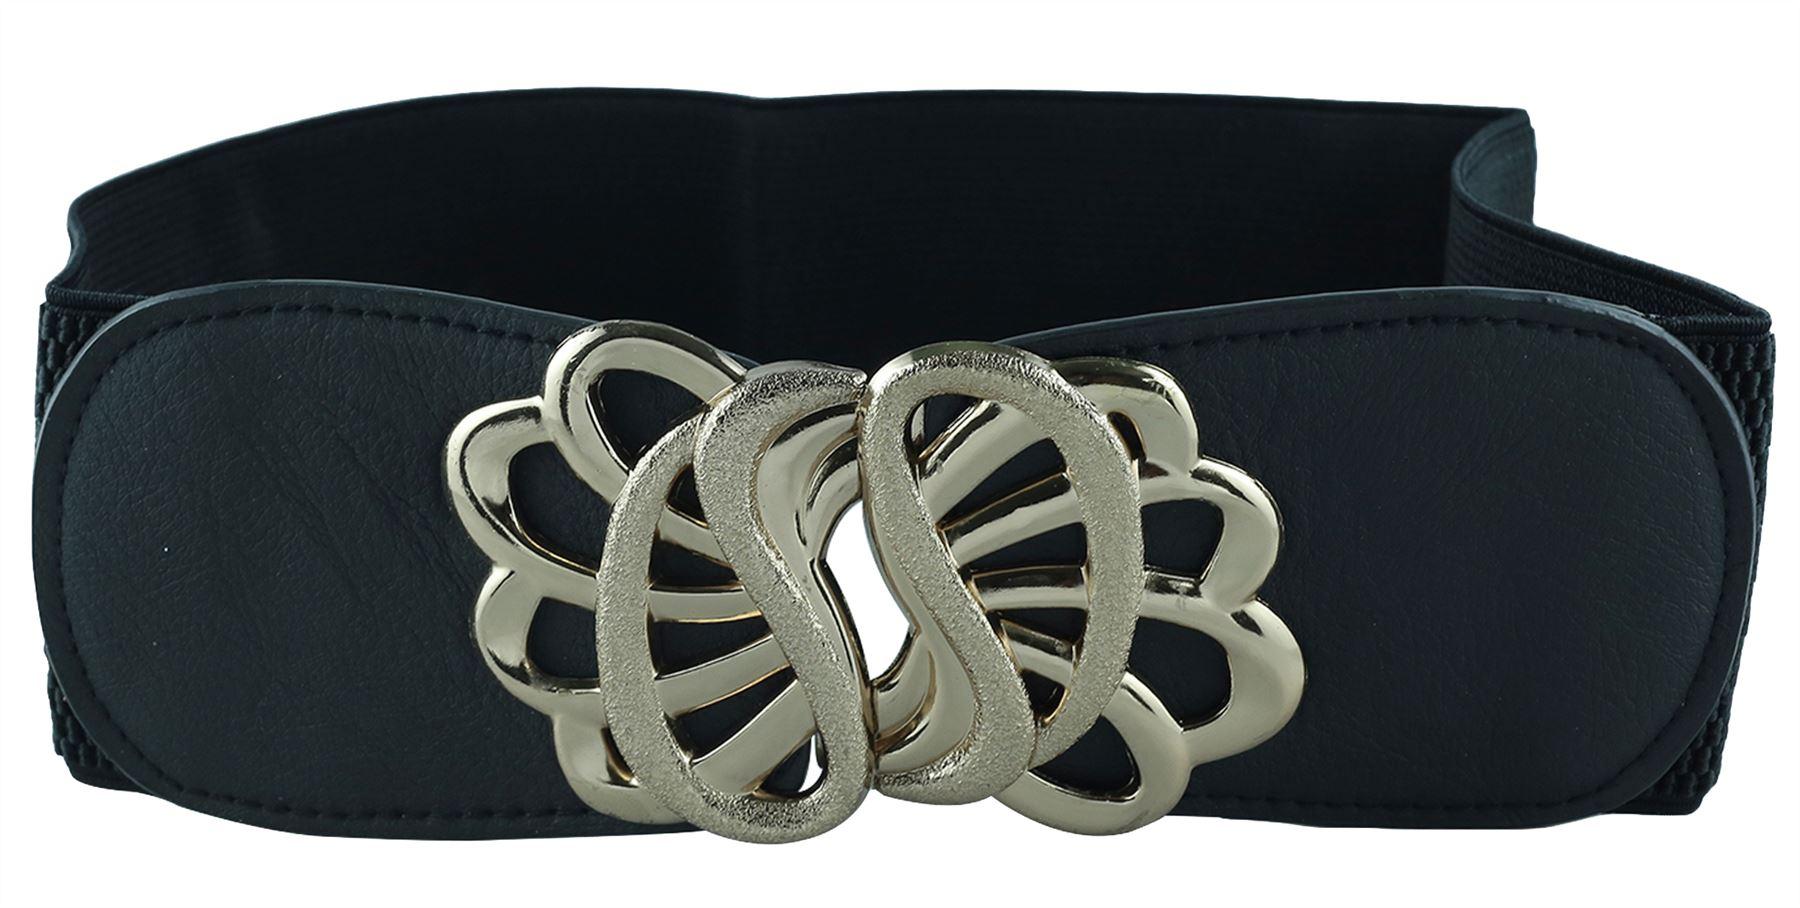 Da Donna Floreale Interblocco fibbia Stretch elastico in vita Cinture di Pelle PU Taglia Unica